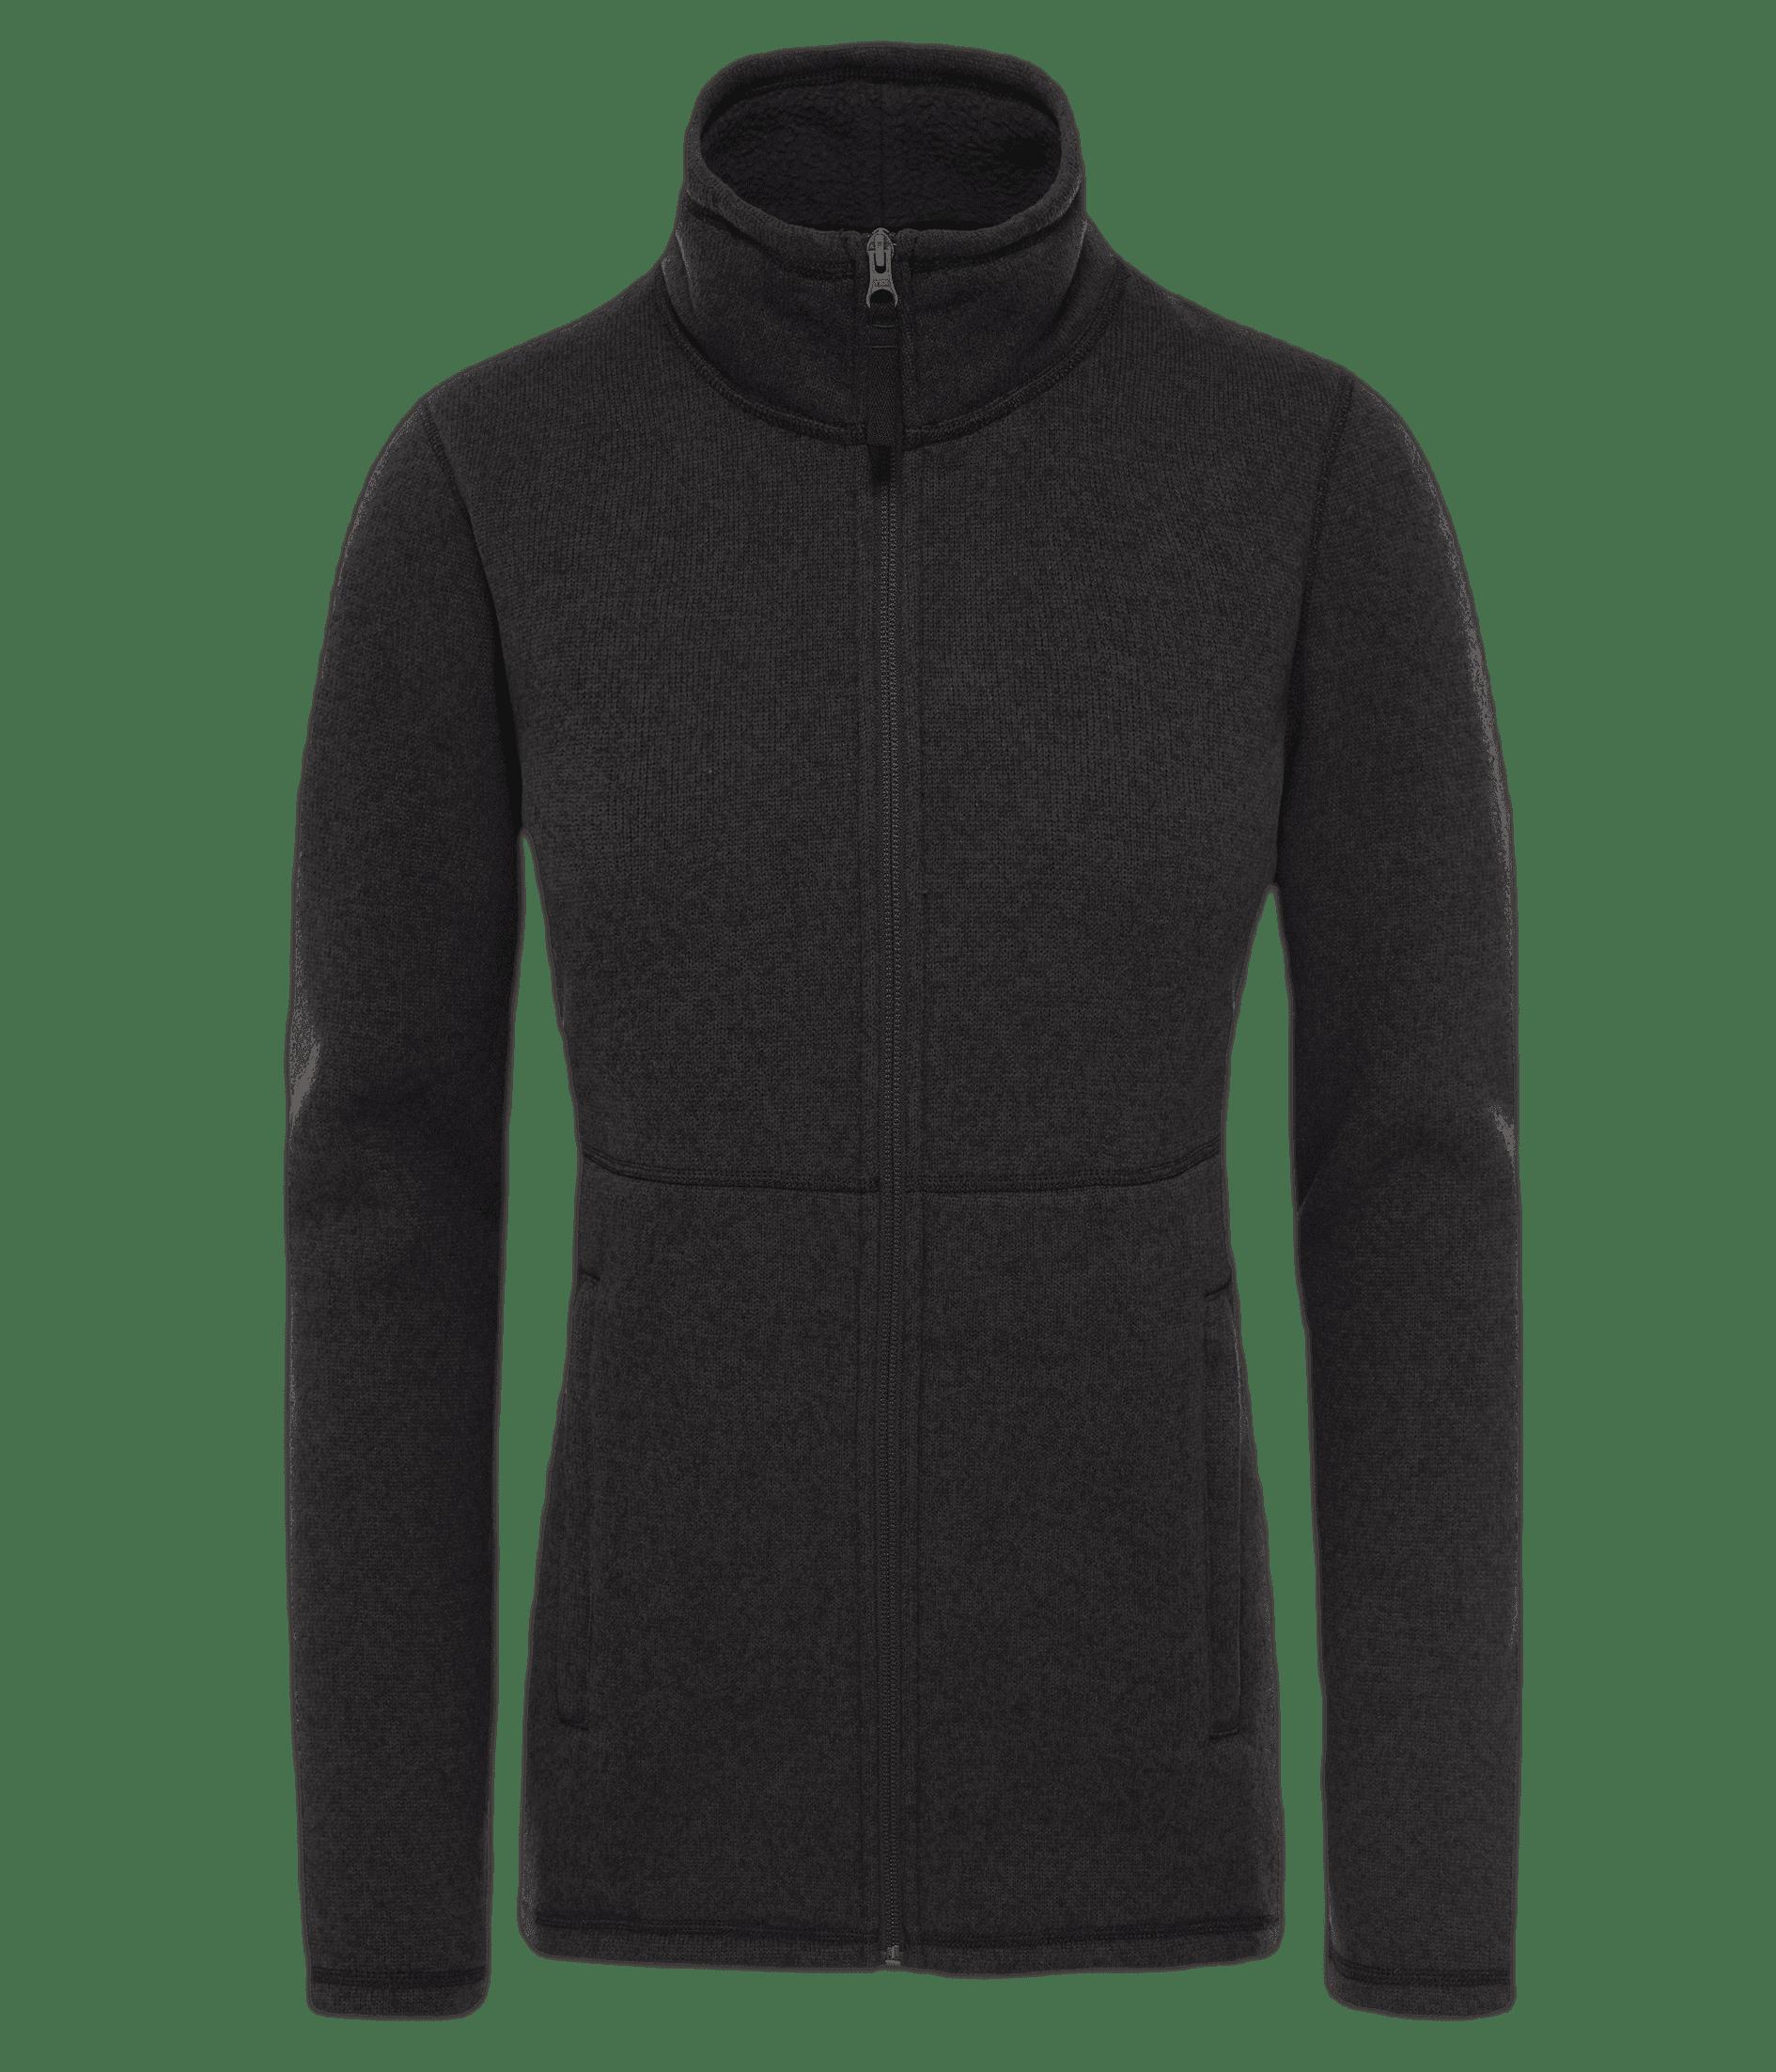 Fl sweater f/z crescent